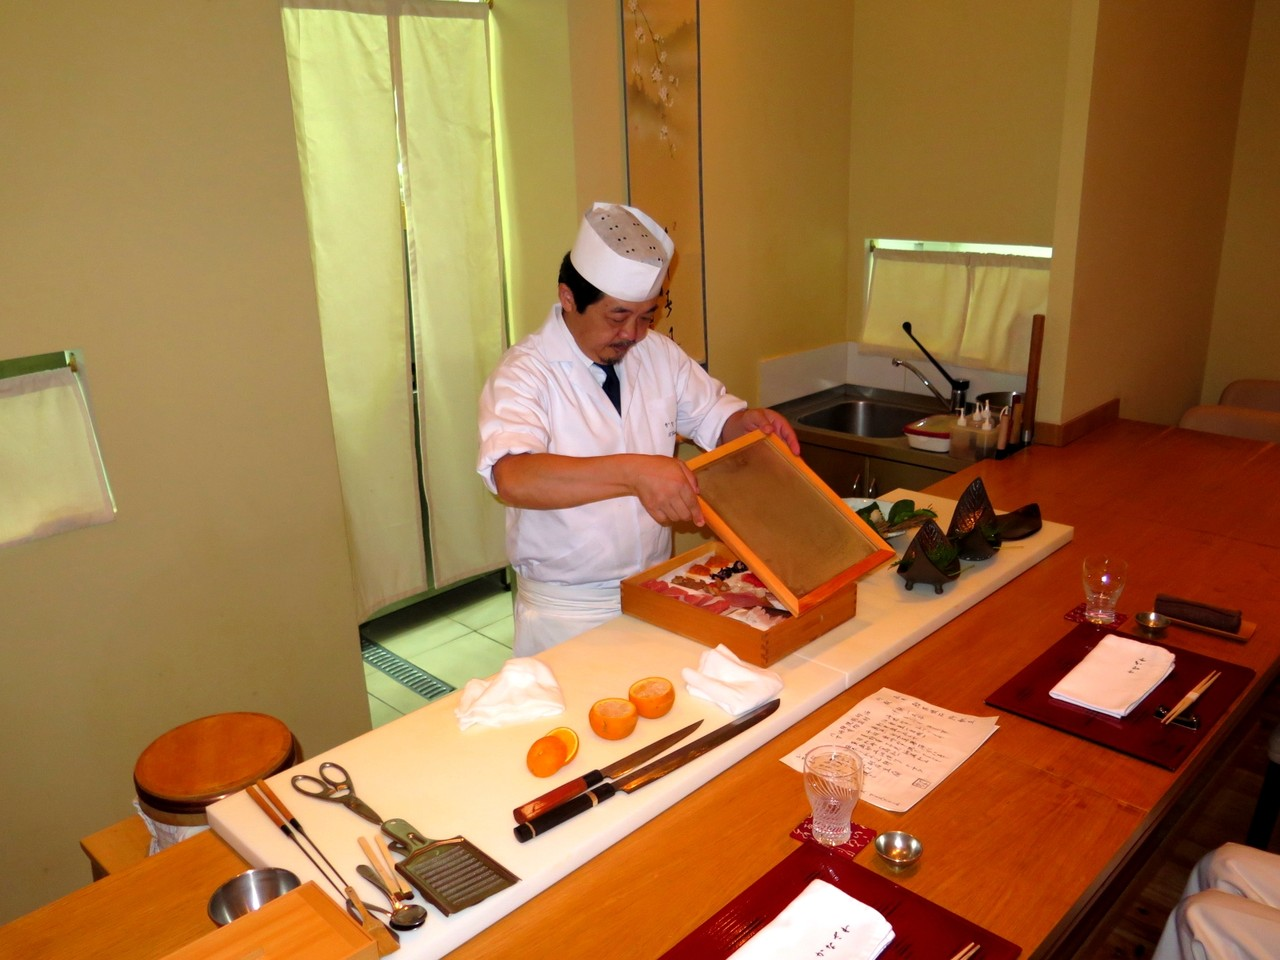 Tomoaki e o balcão de 8 lugares do KANAZAWA